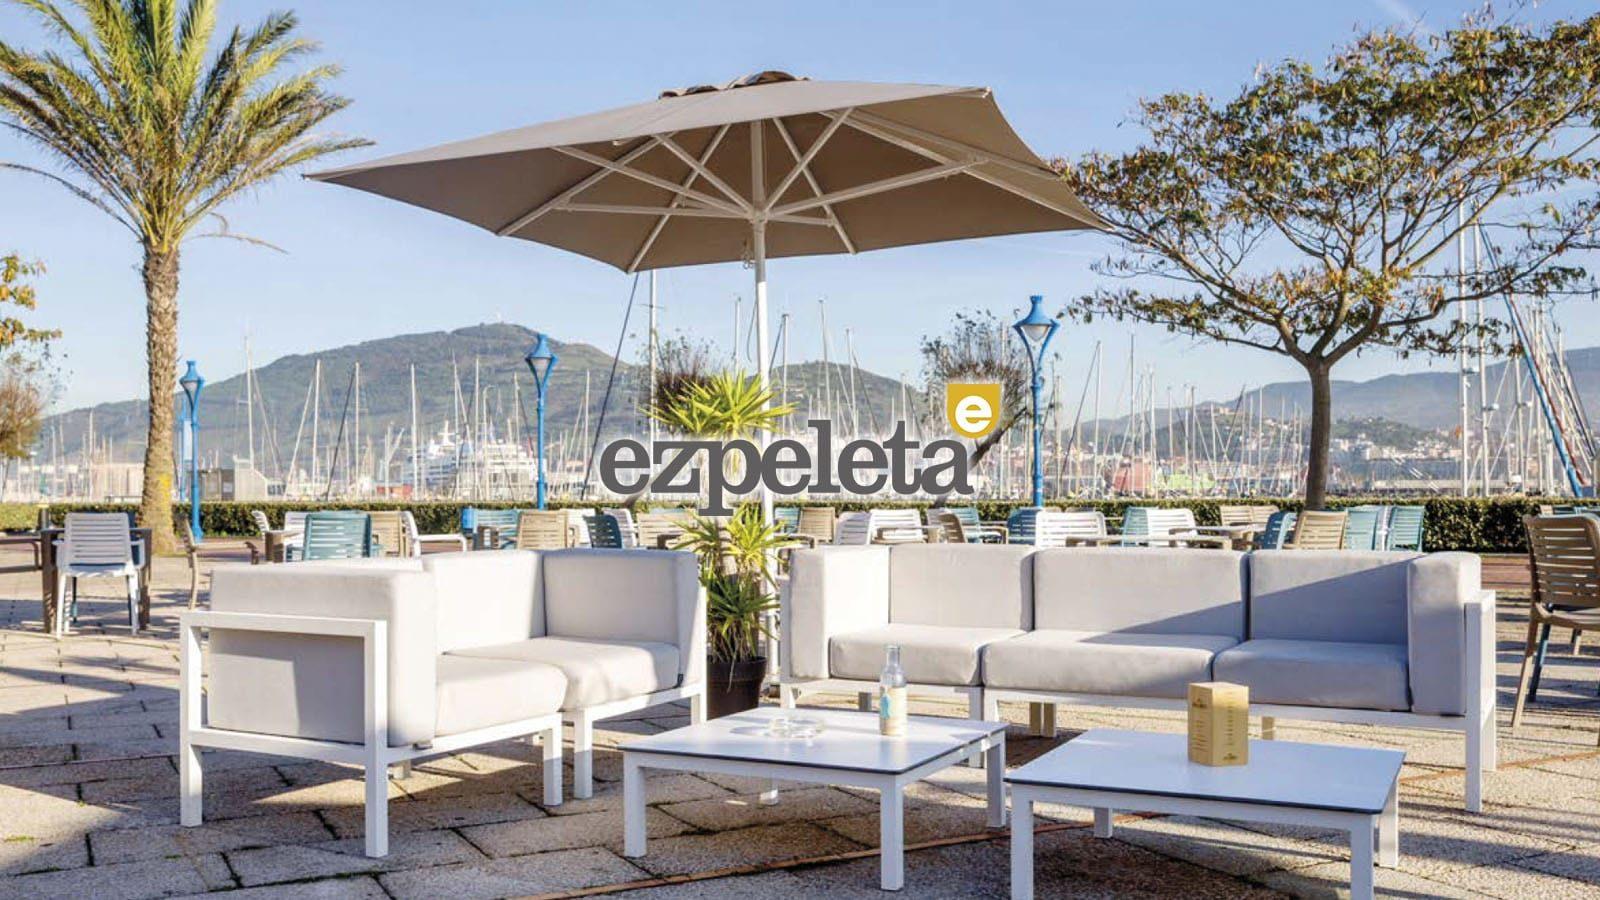 Ezpeleta Outdoor Furniture and Parasols